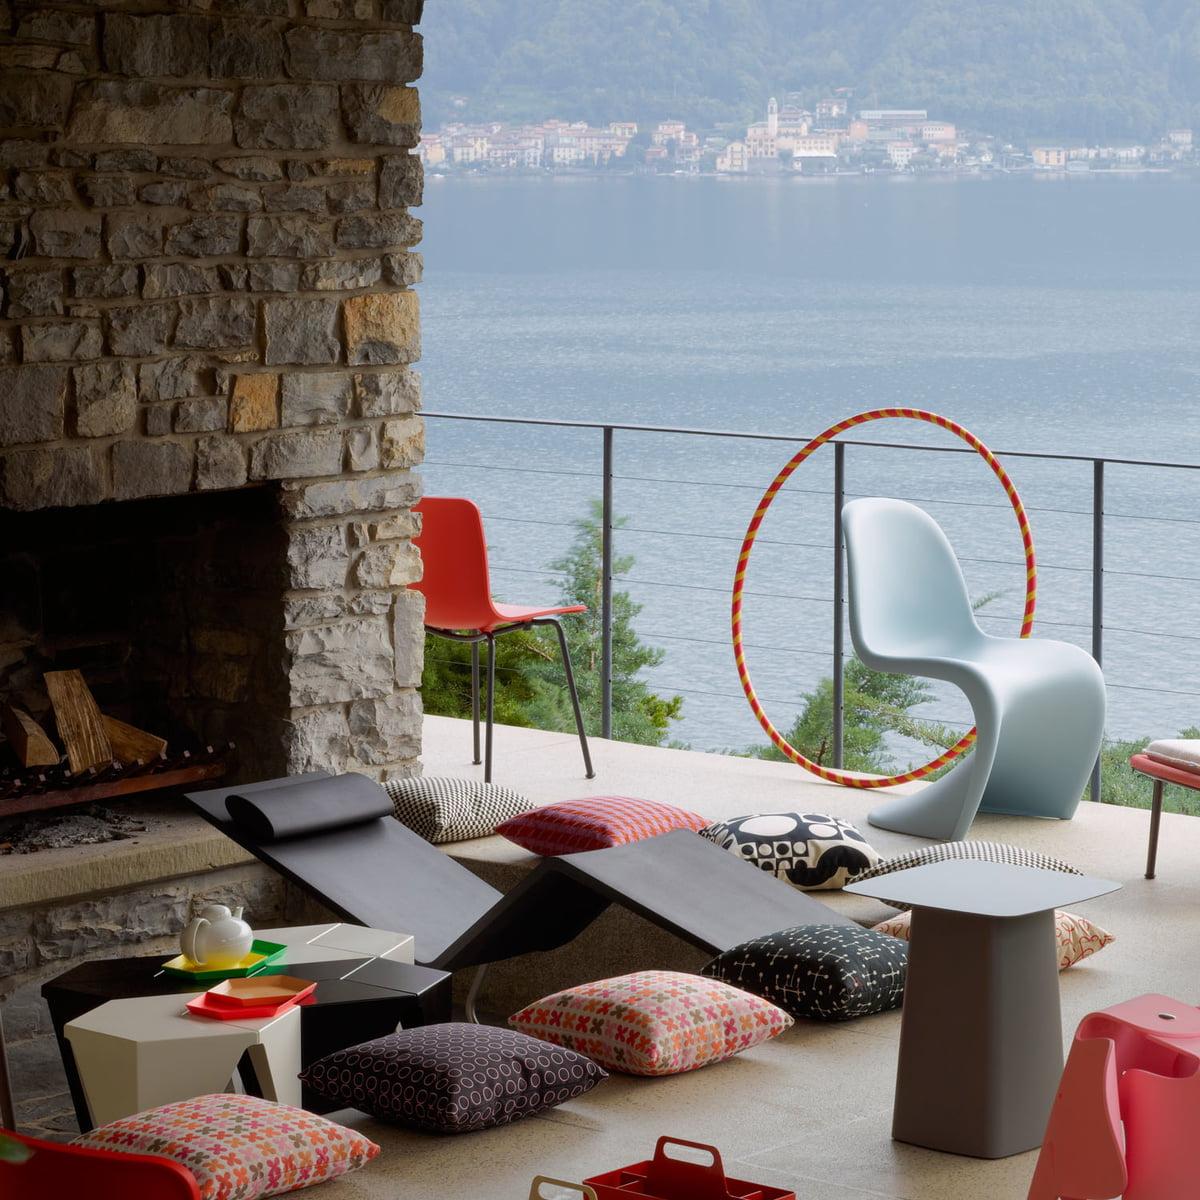 vitra kissen small dot pattern document reserve. Black Bedroom Furniture Sets. Home Design Ideas